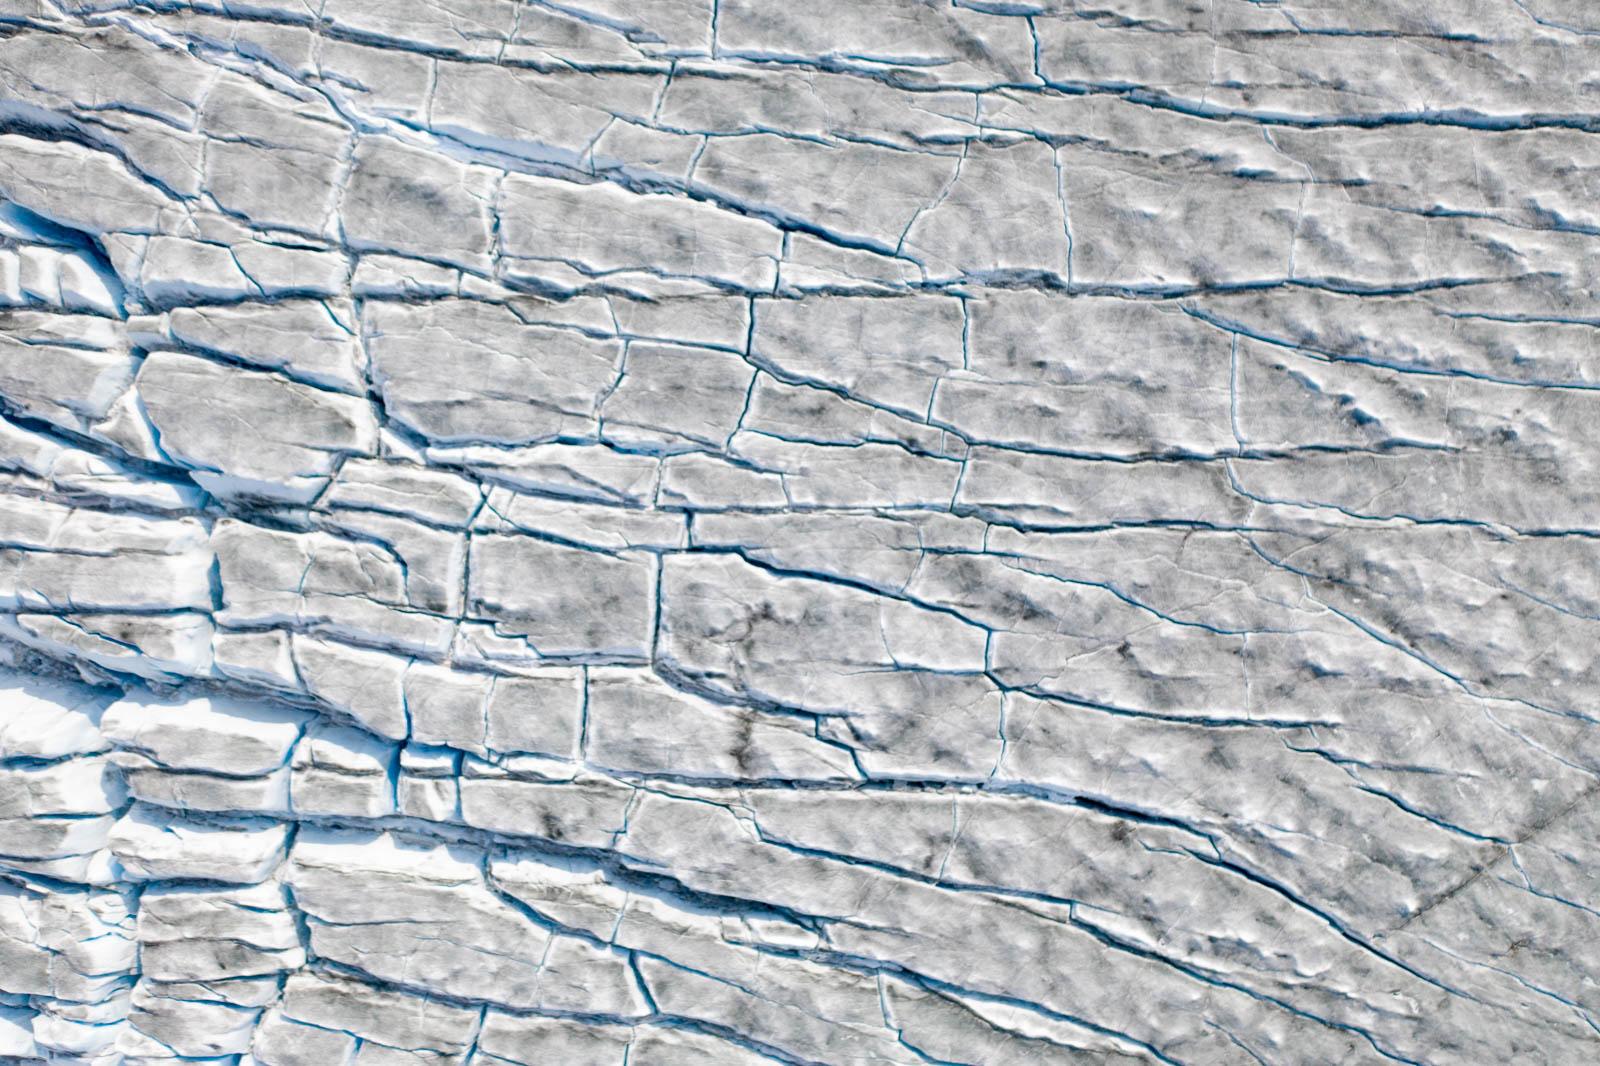 Ostgrönland, Grönland, Gletscher, Drohne, Mavic 2 Pro, Panorama